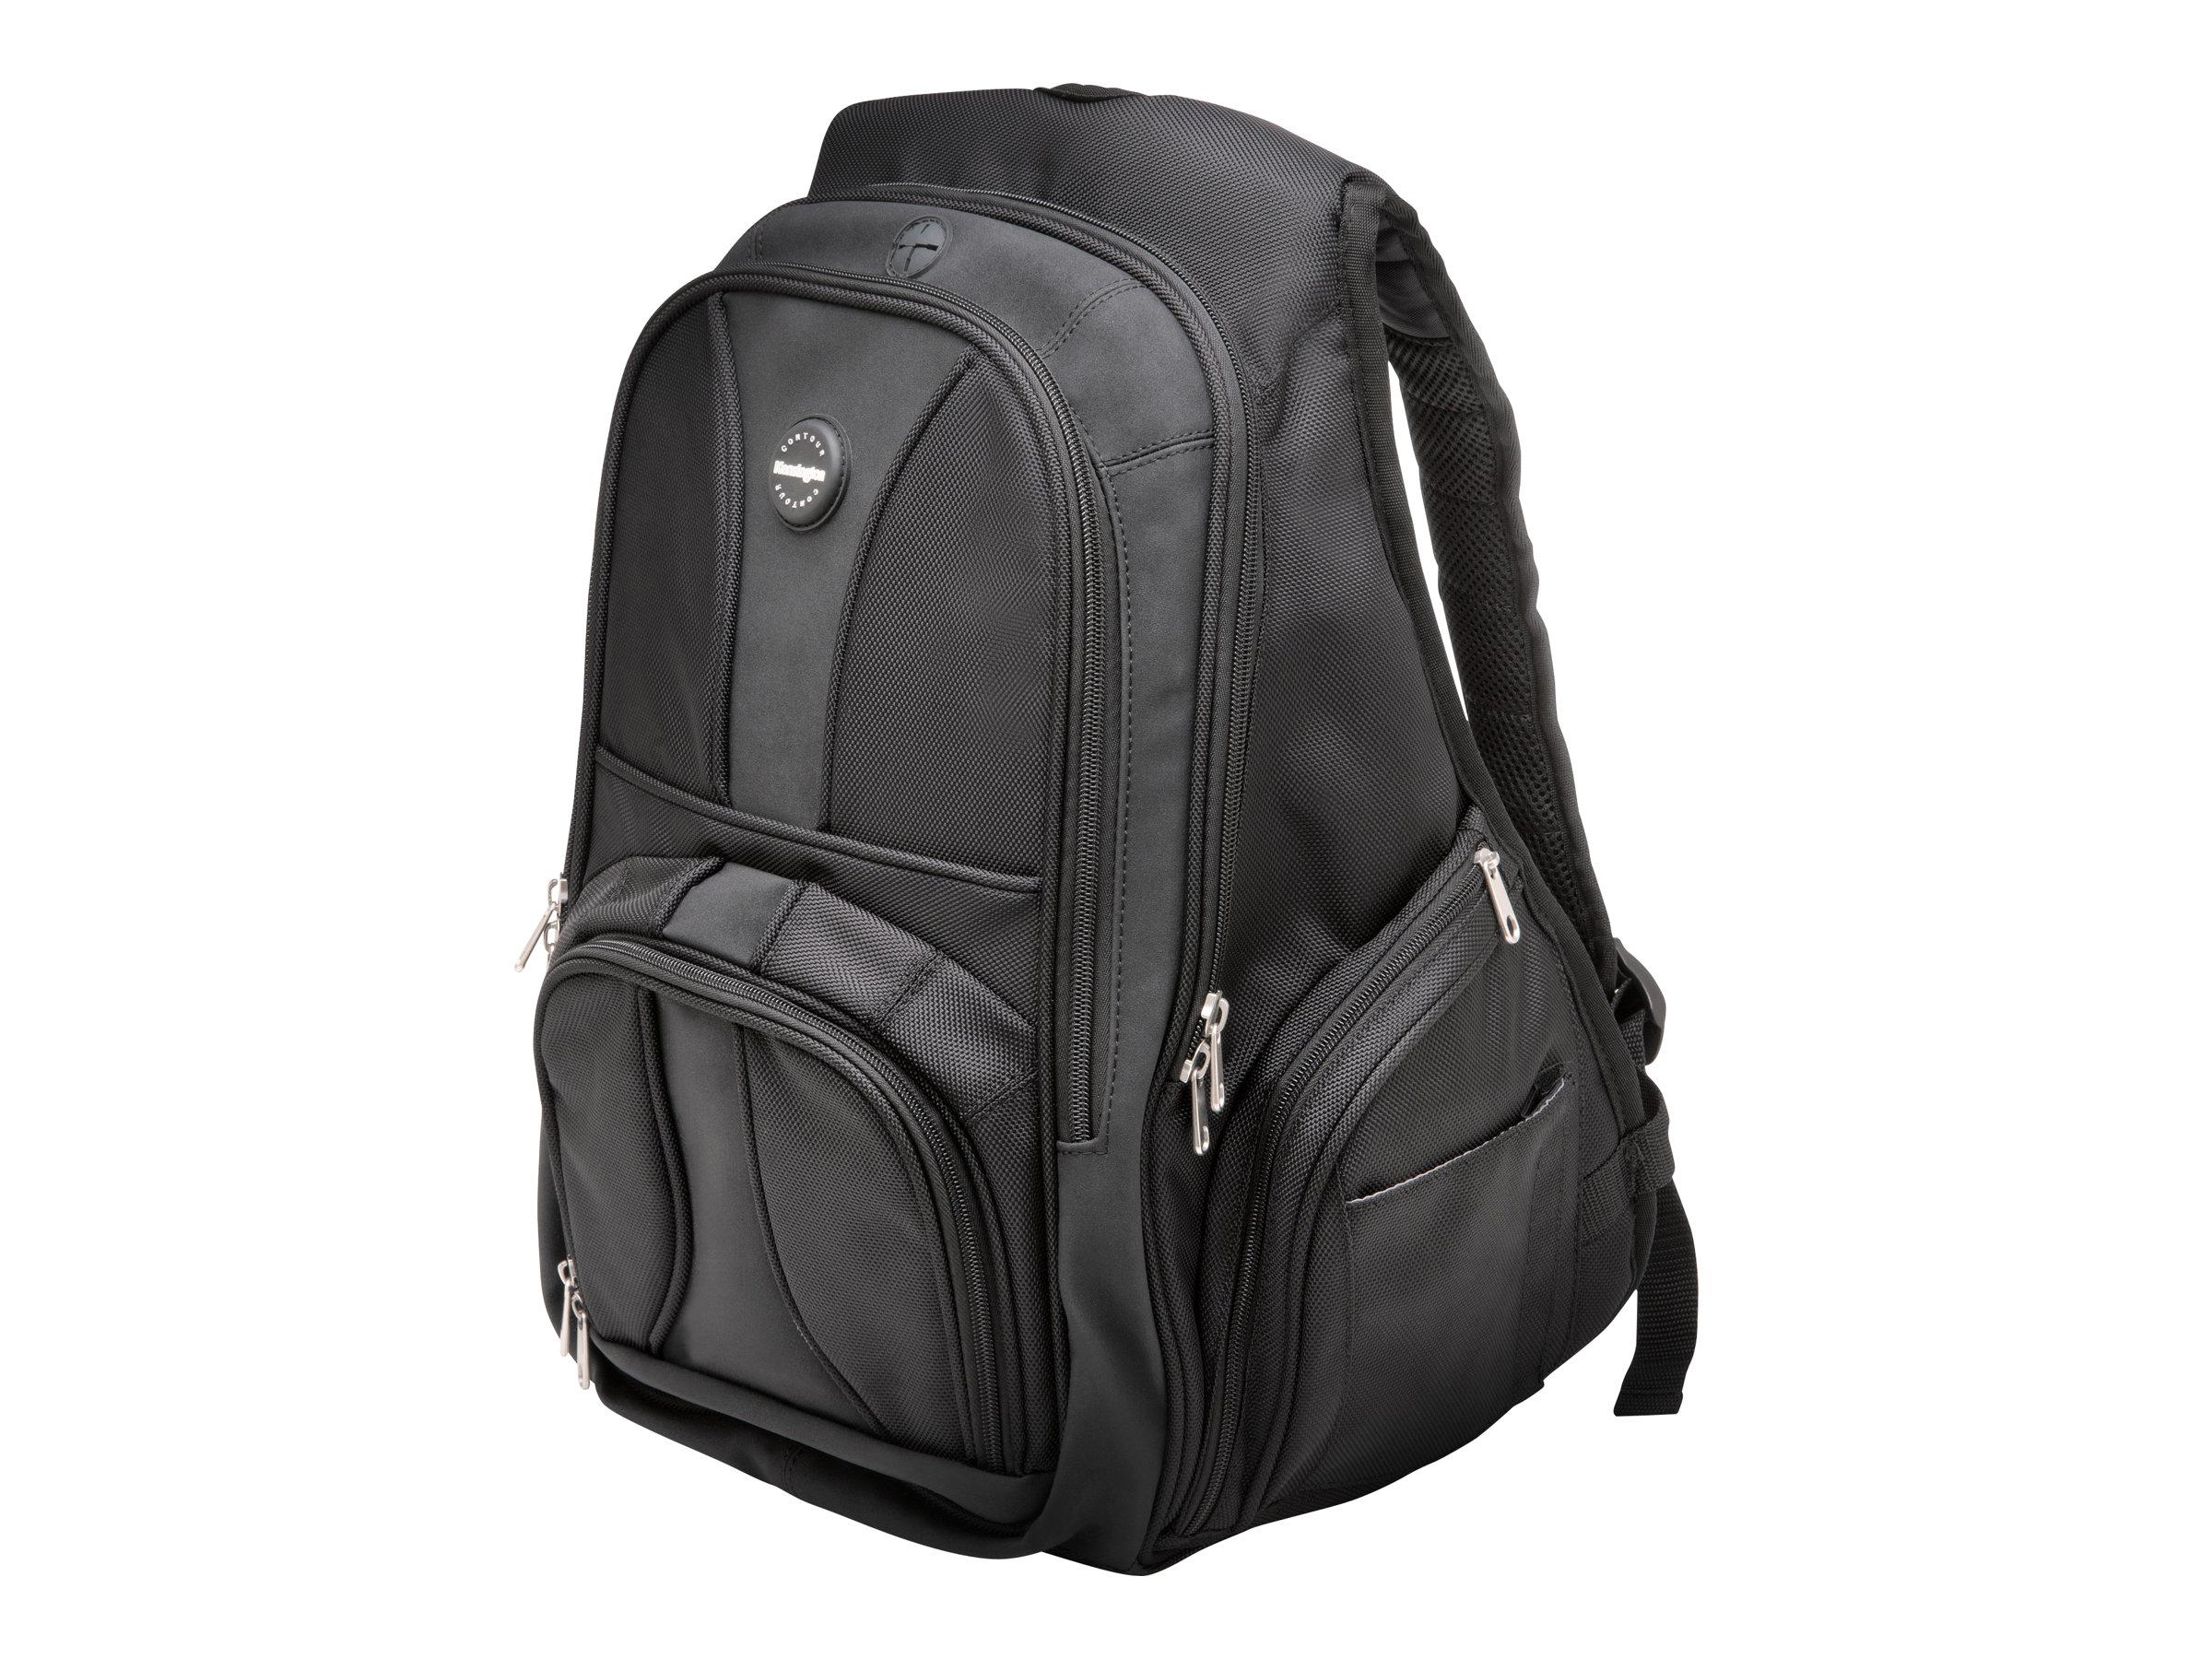 Kensington Contour Backpack - Notebook-Rucksack - 40.6 cm (16